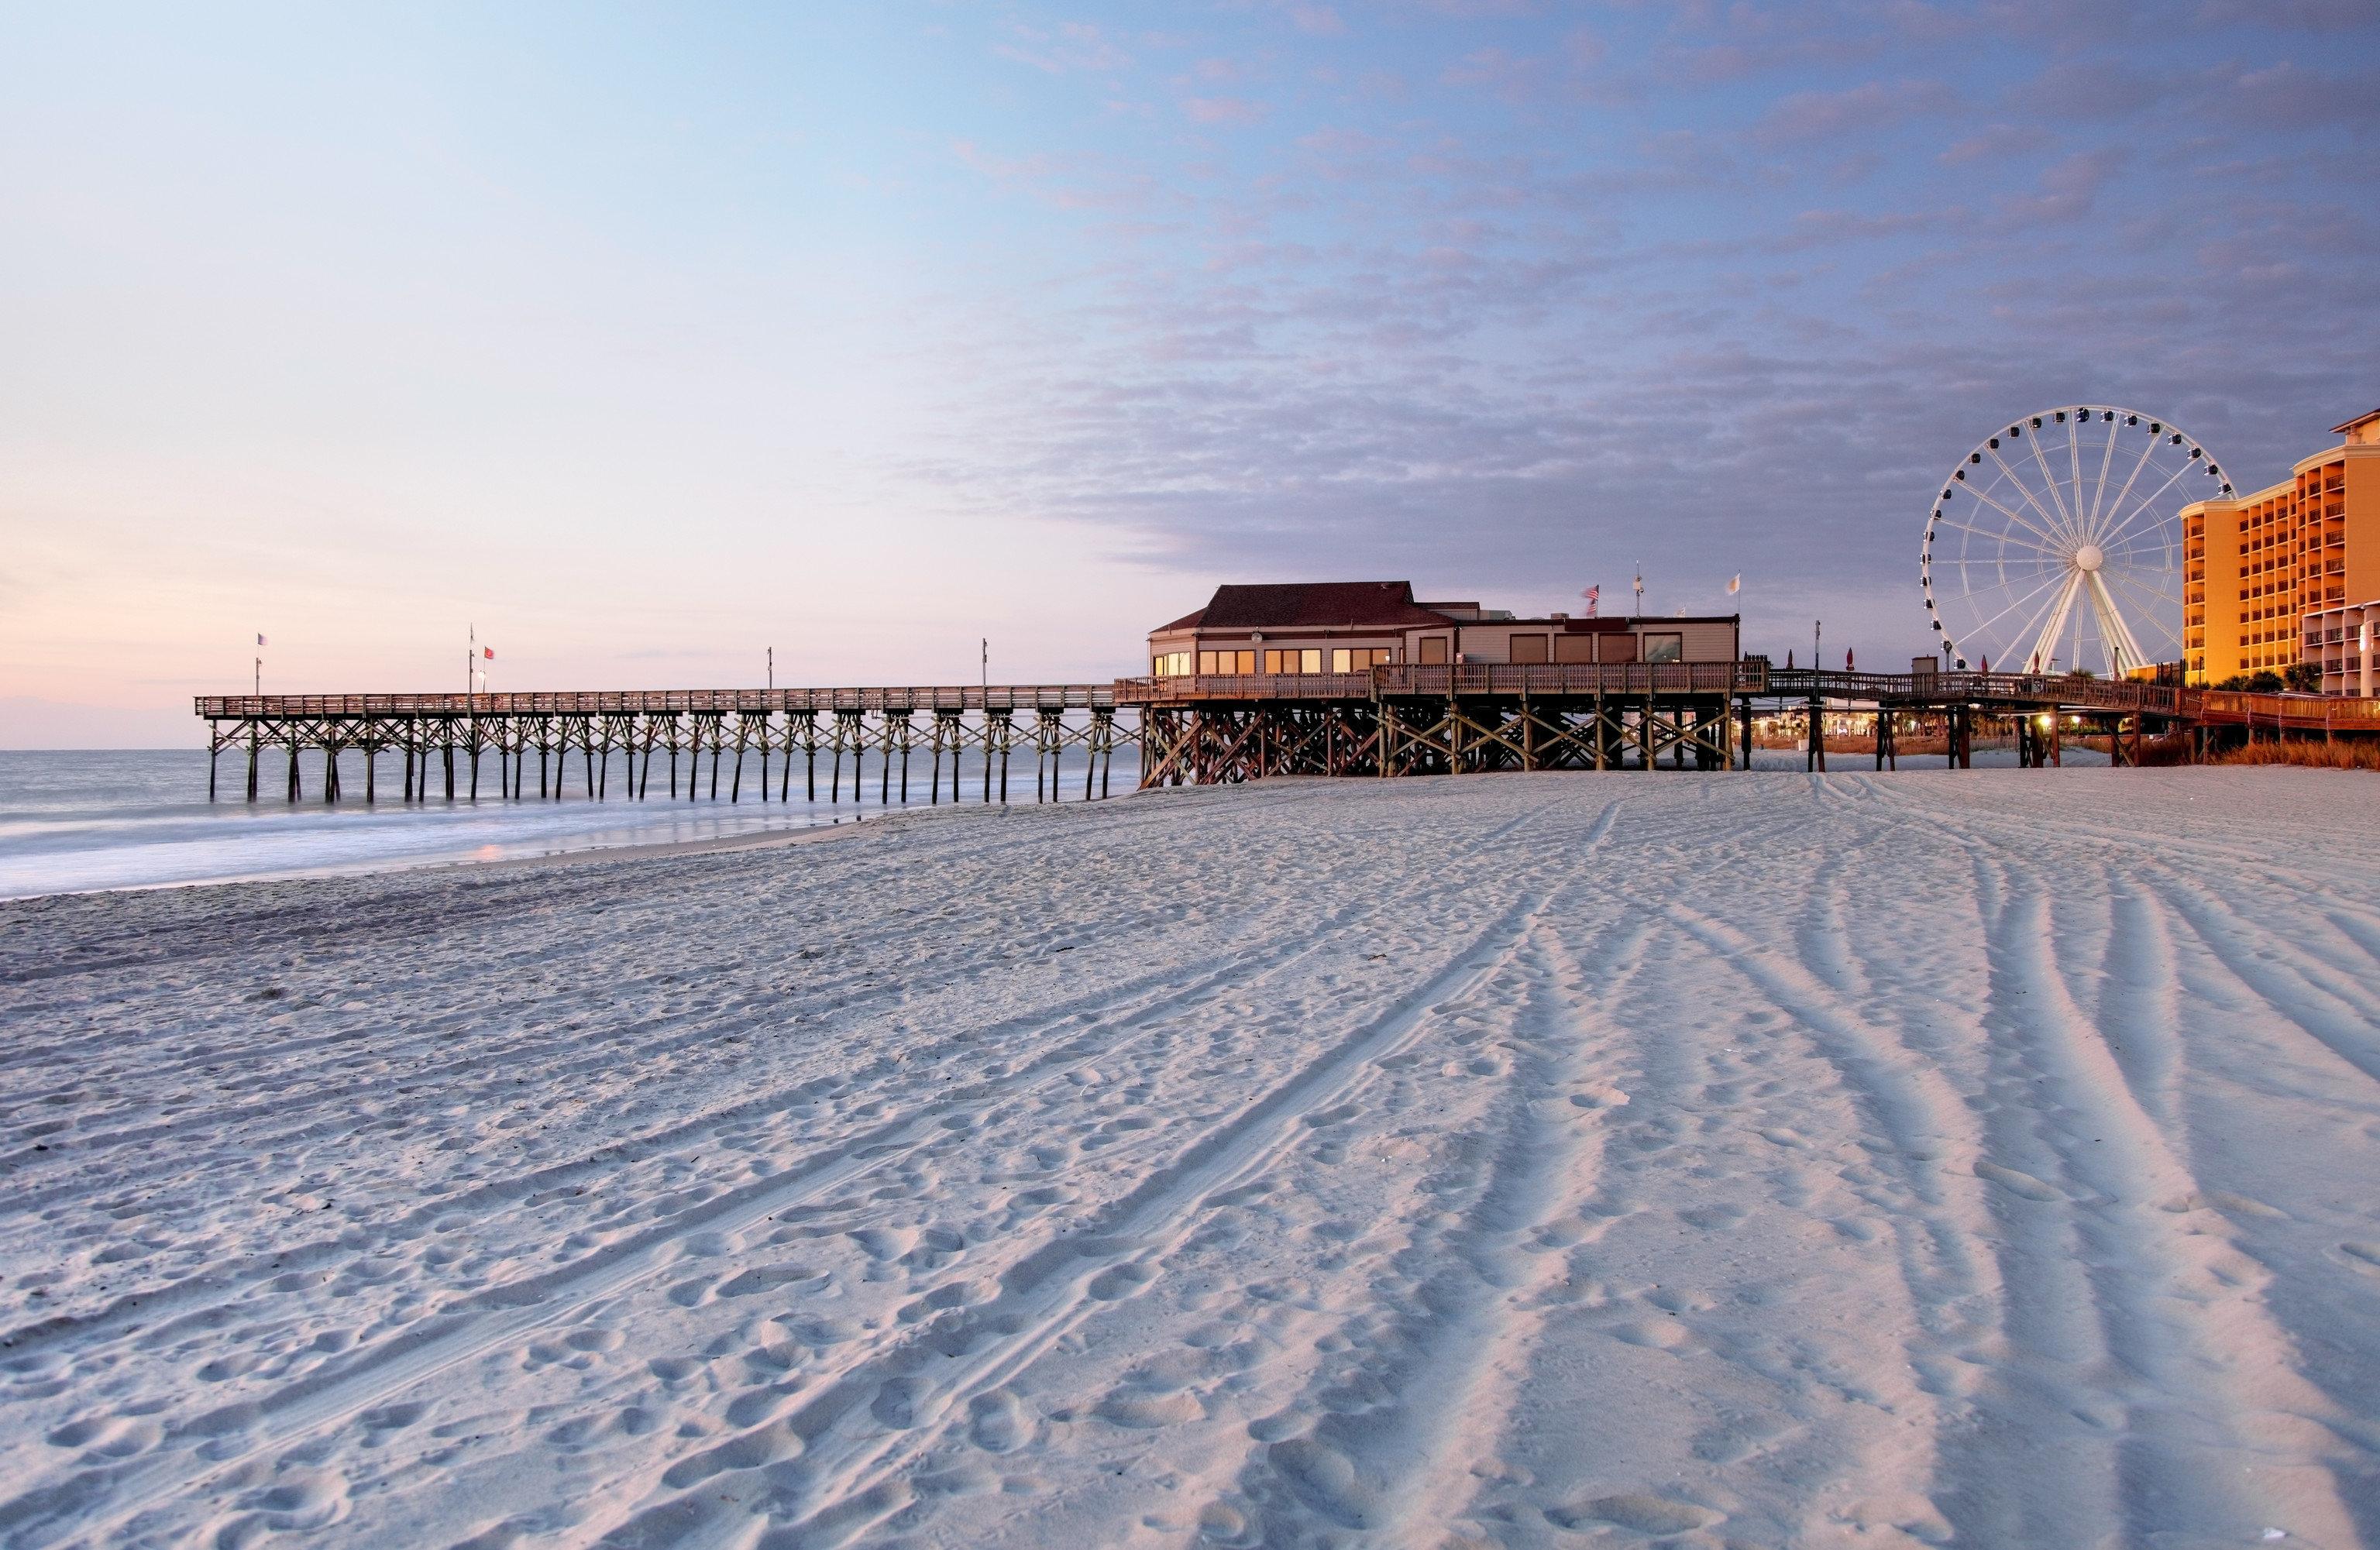 News Trip Ideas sky outdoor pier ground scene snow Winter weather horizon season Ocean morning Sea Beach evening wave sand